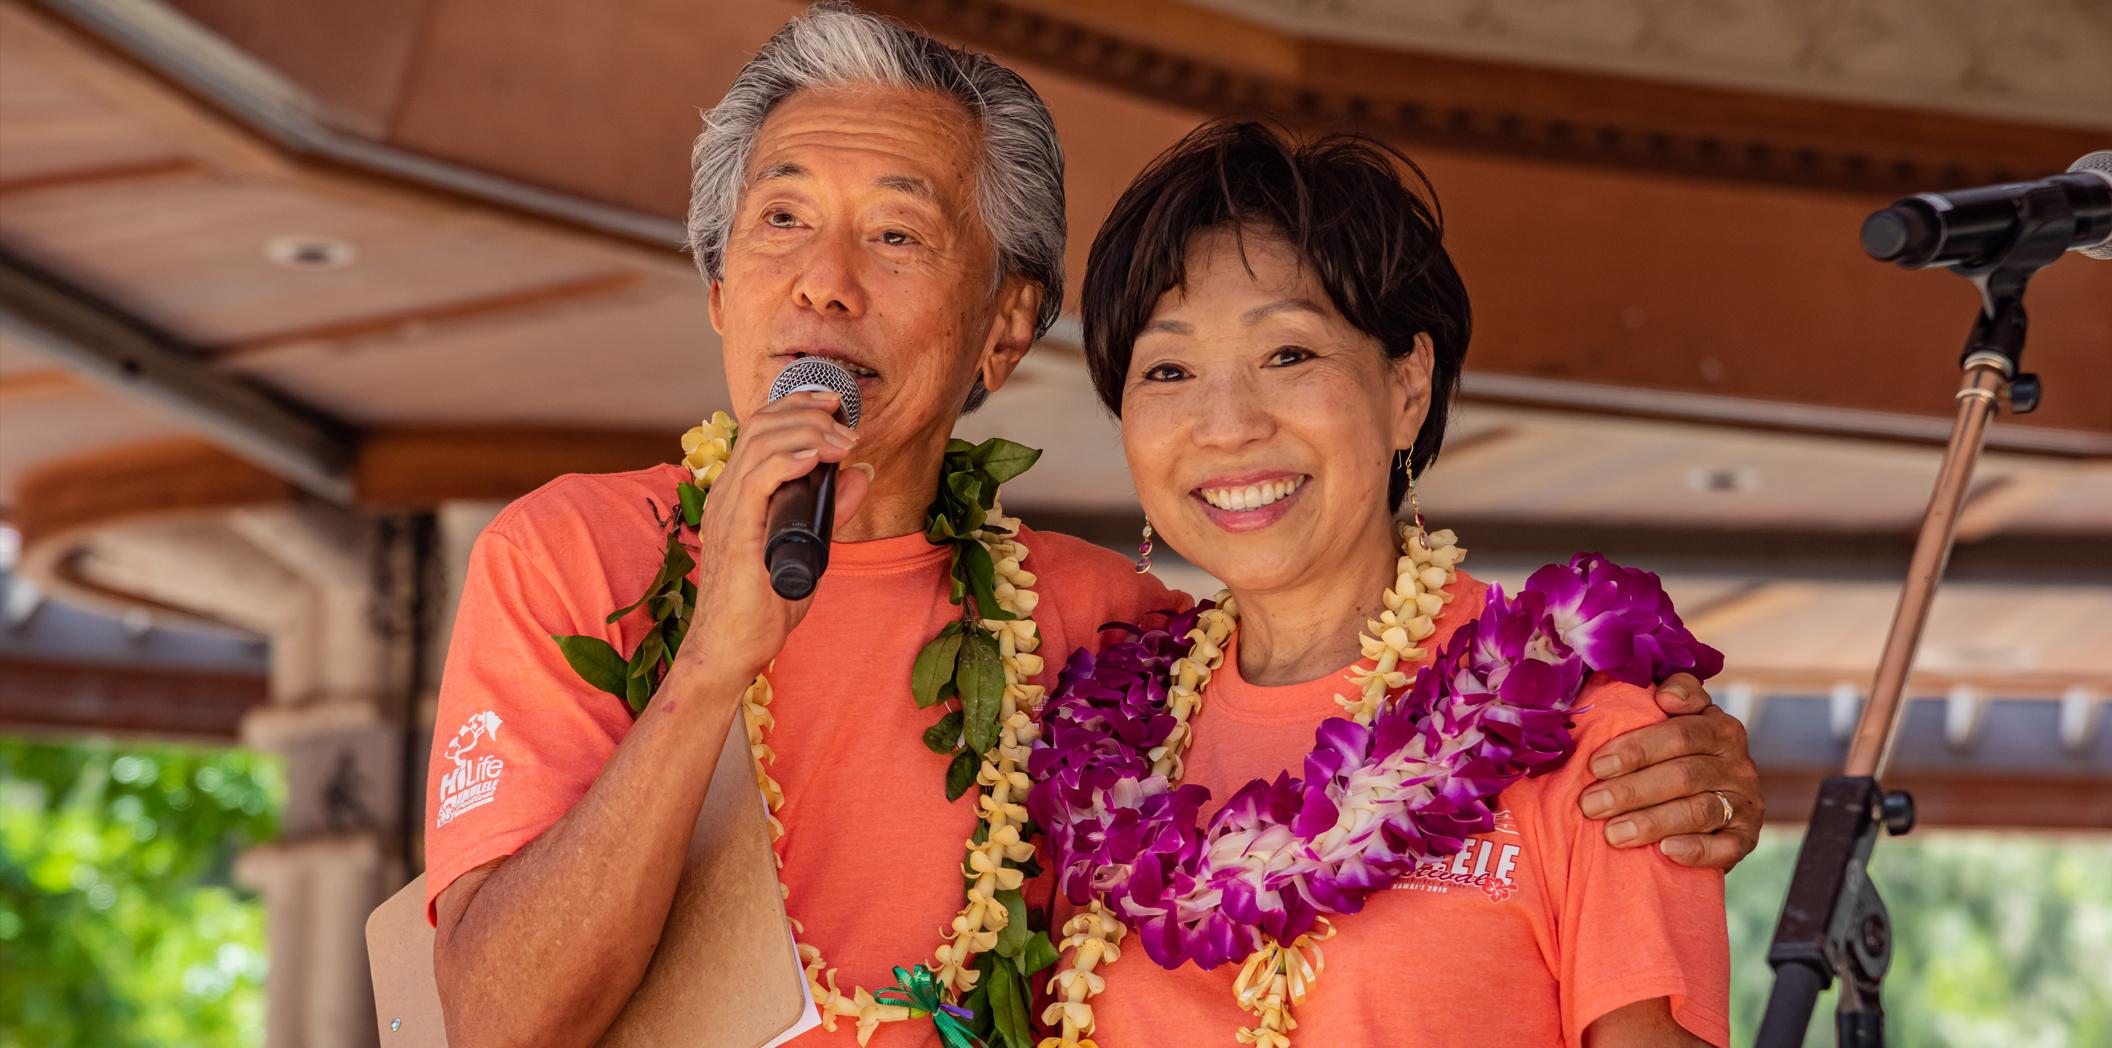 Roy and Kathy Sakuma